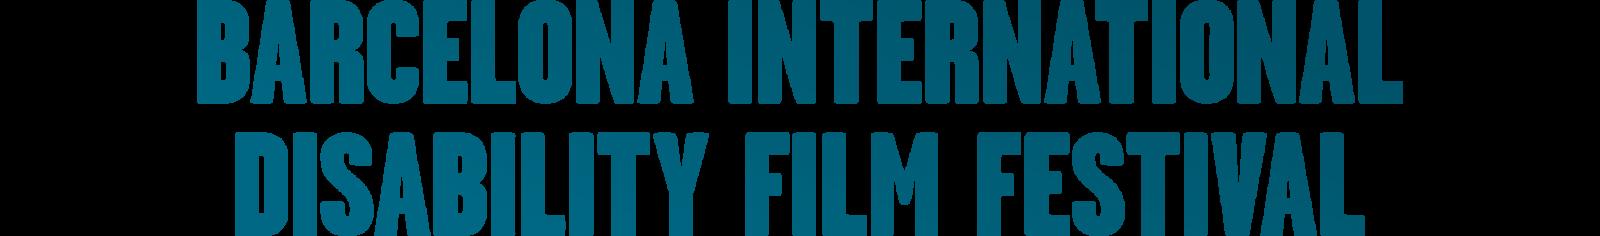 Barcelona international disability film festival